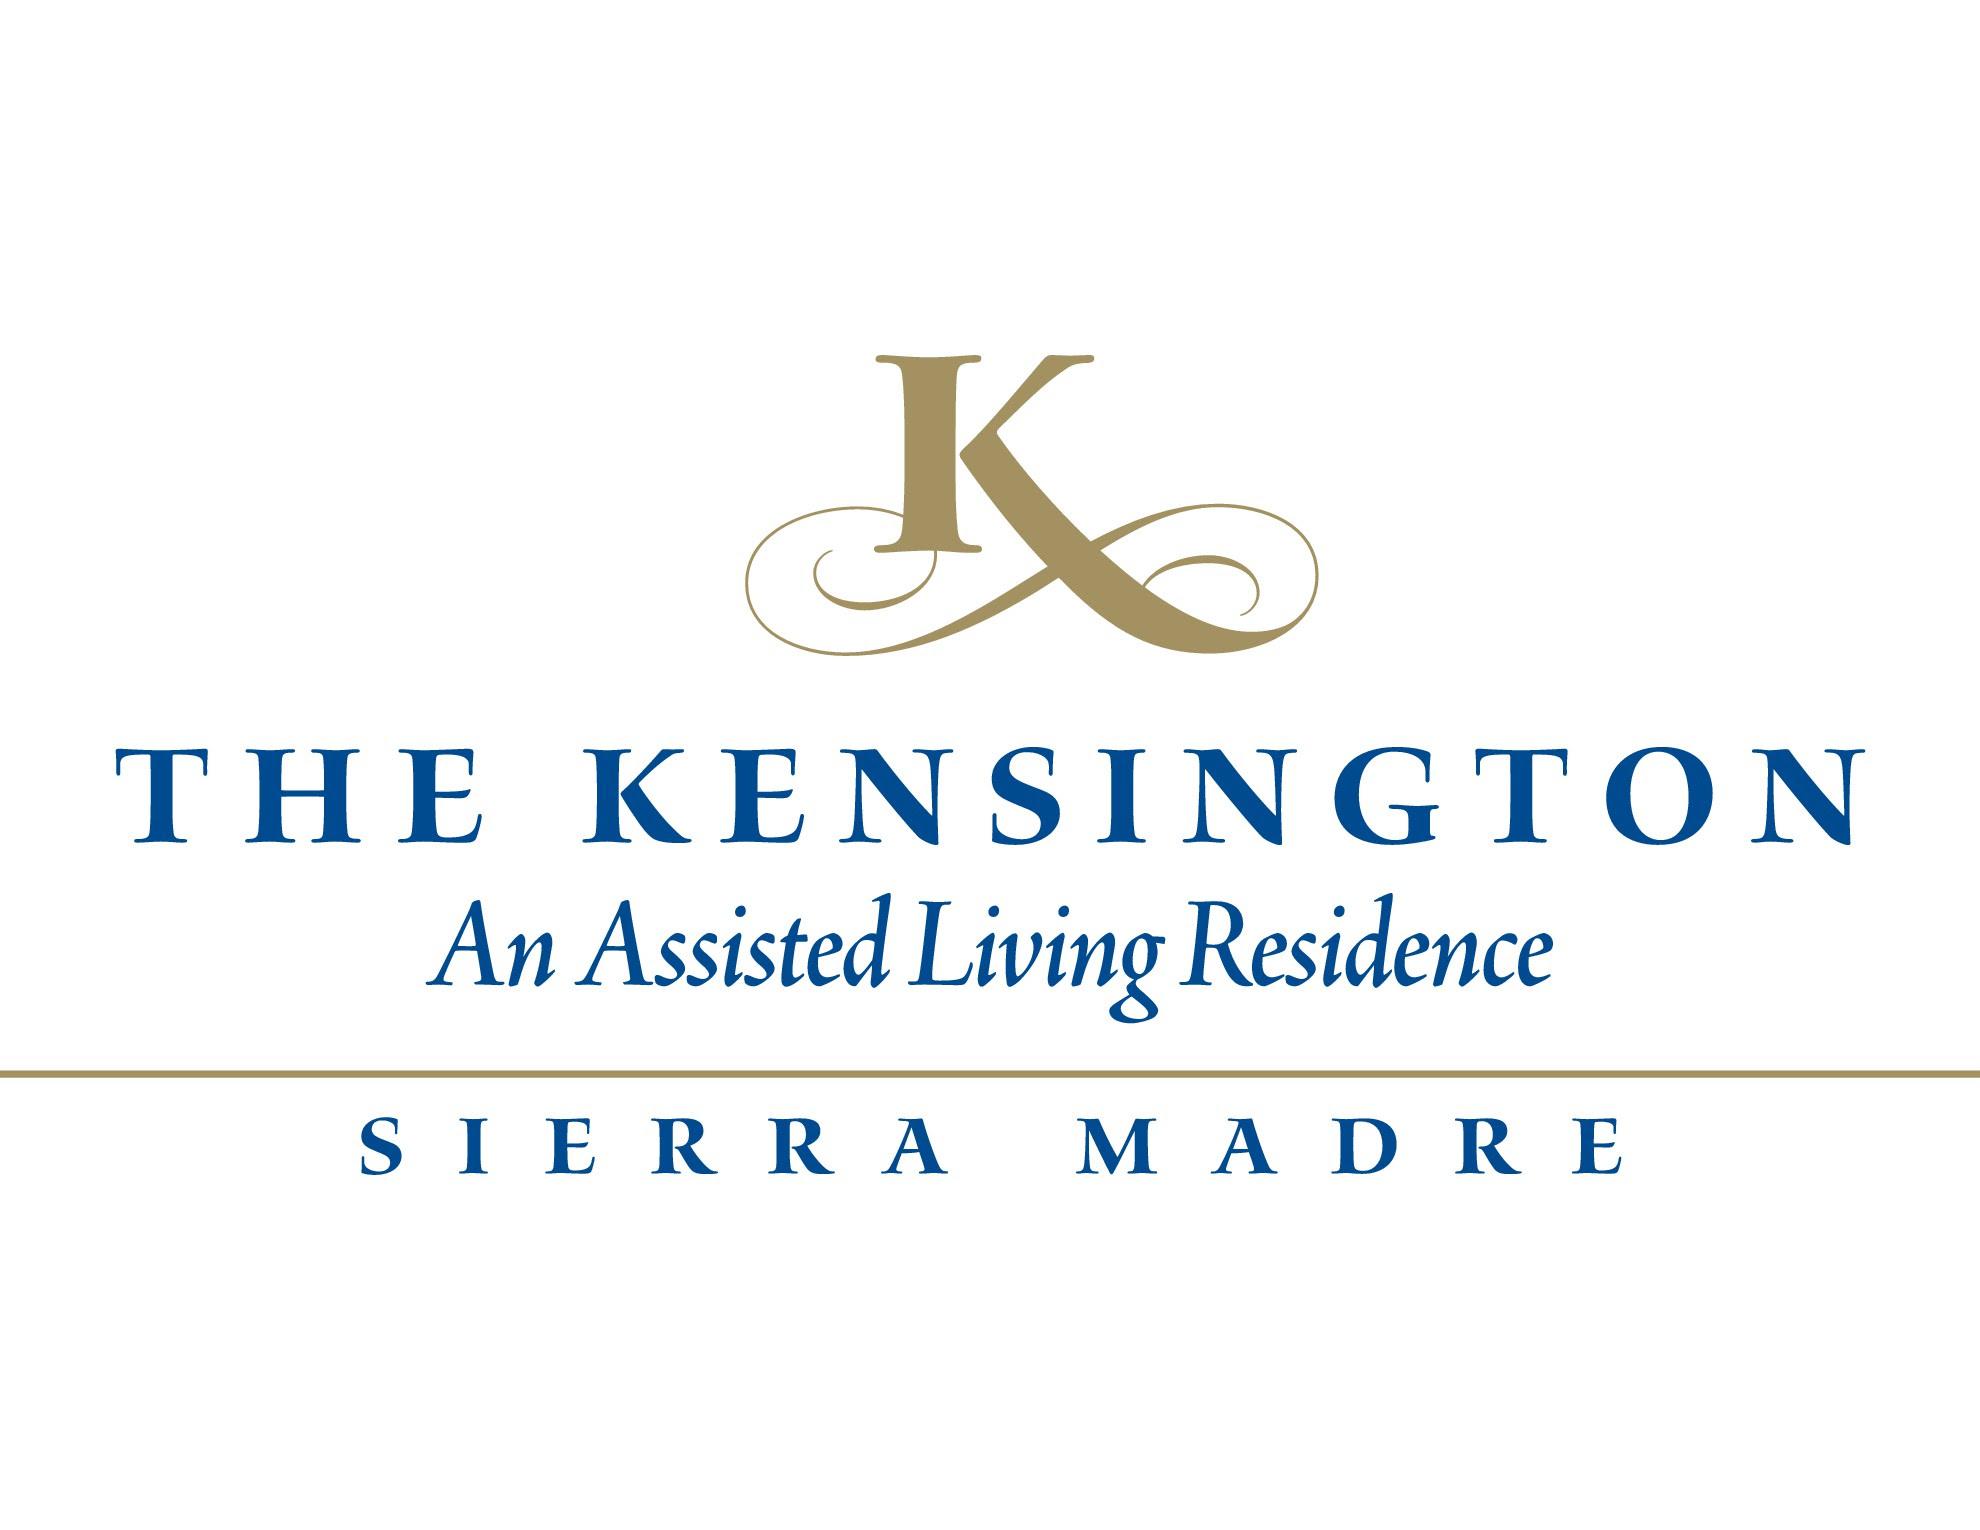 The Kensington JPEG.jpg